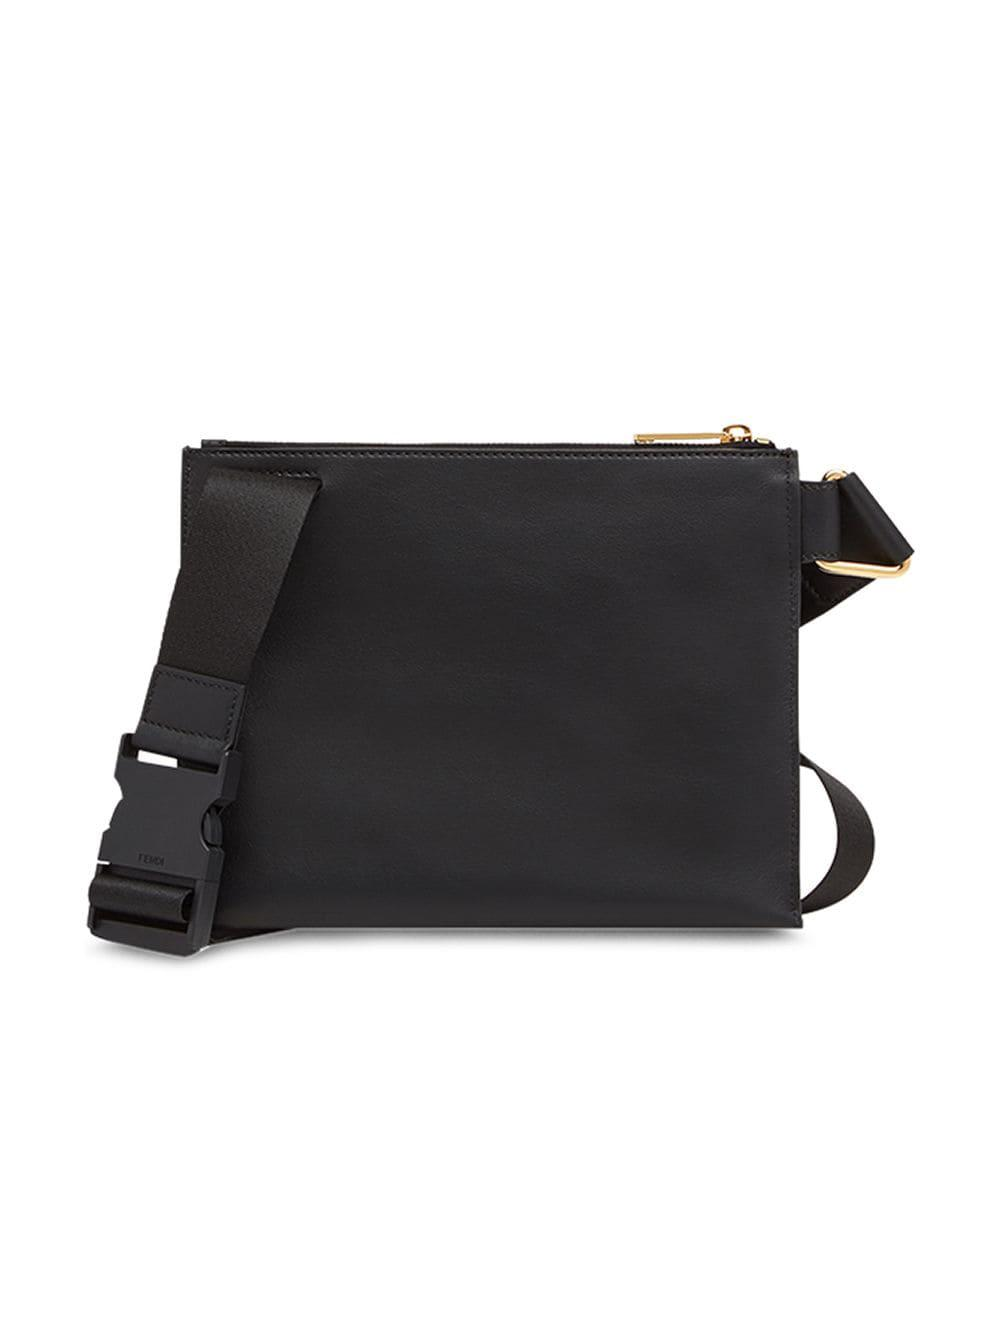 7eb592dbc688 Fendi - Black Slim Zipped Messenger Bag for Men - Lyst. View fullscreen